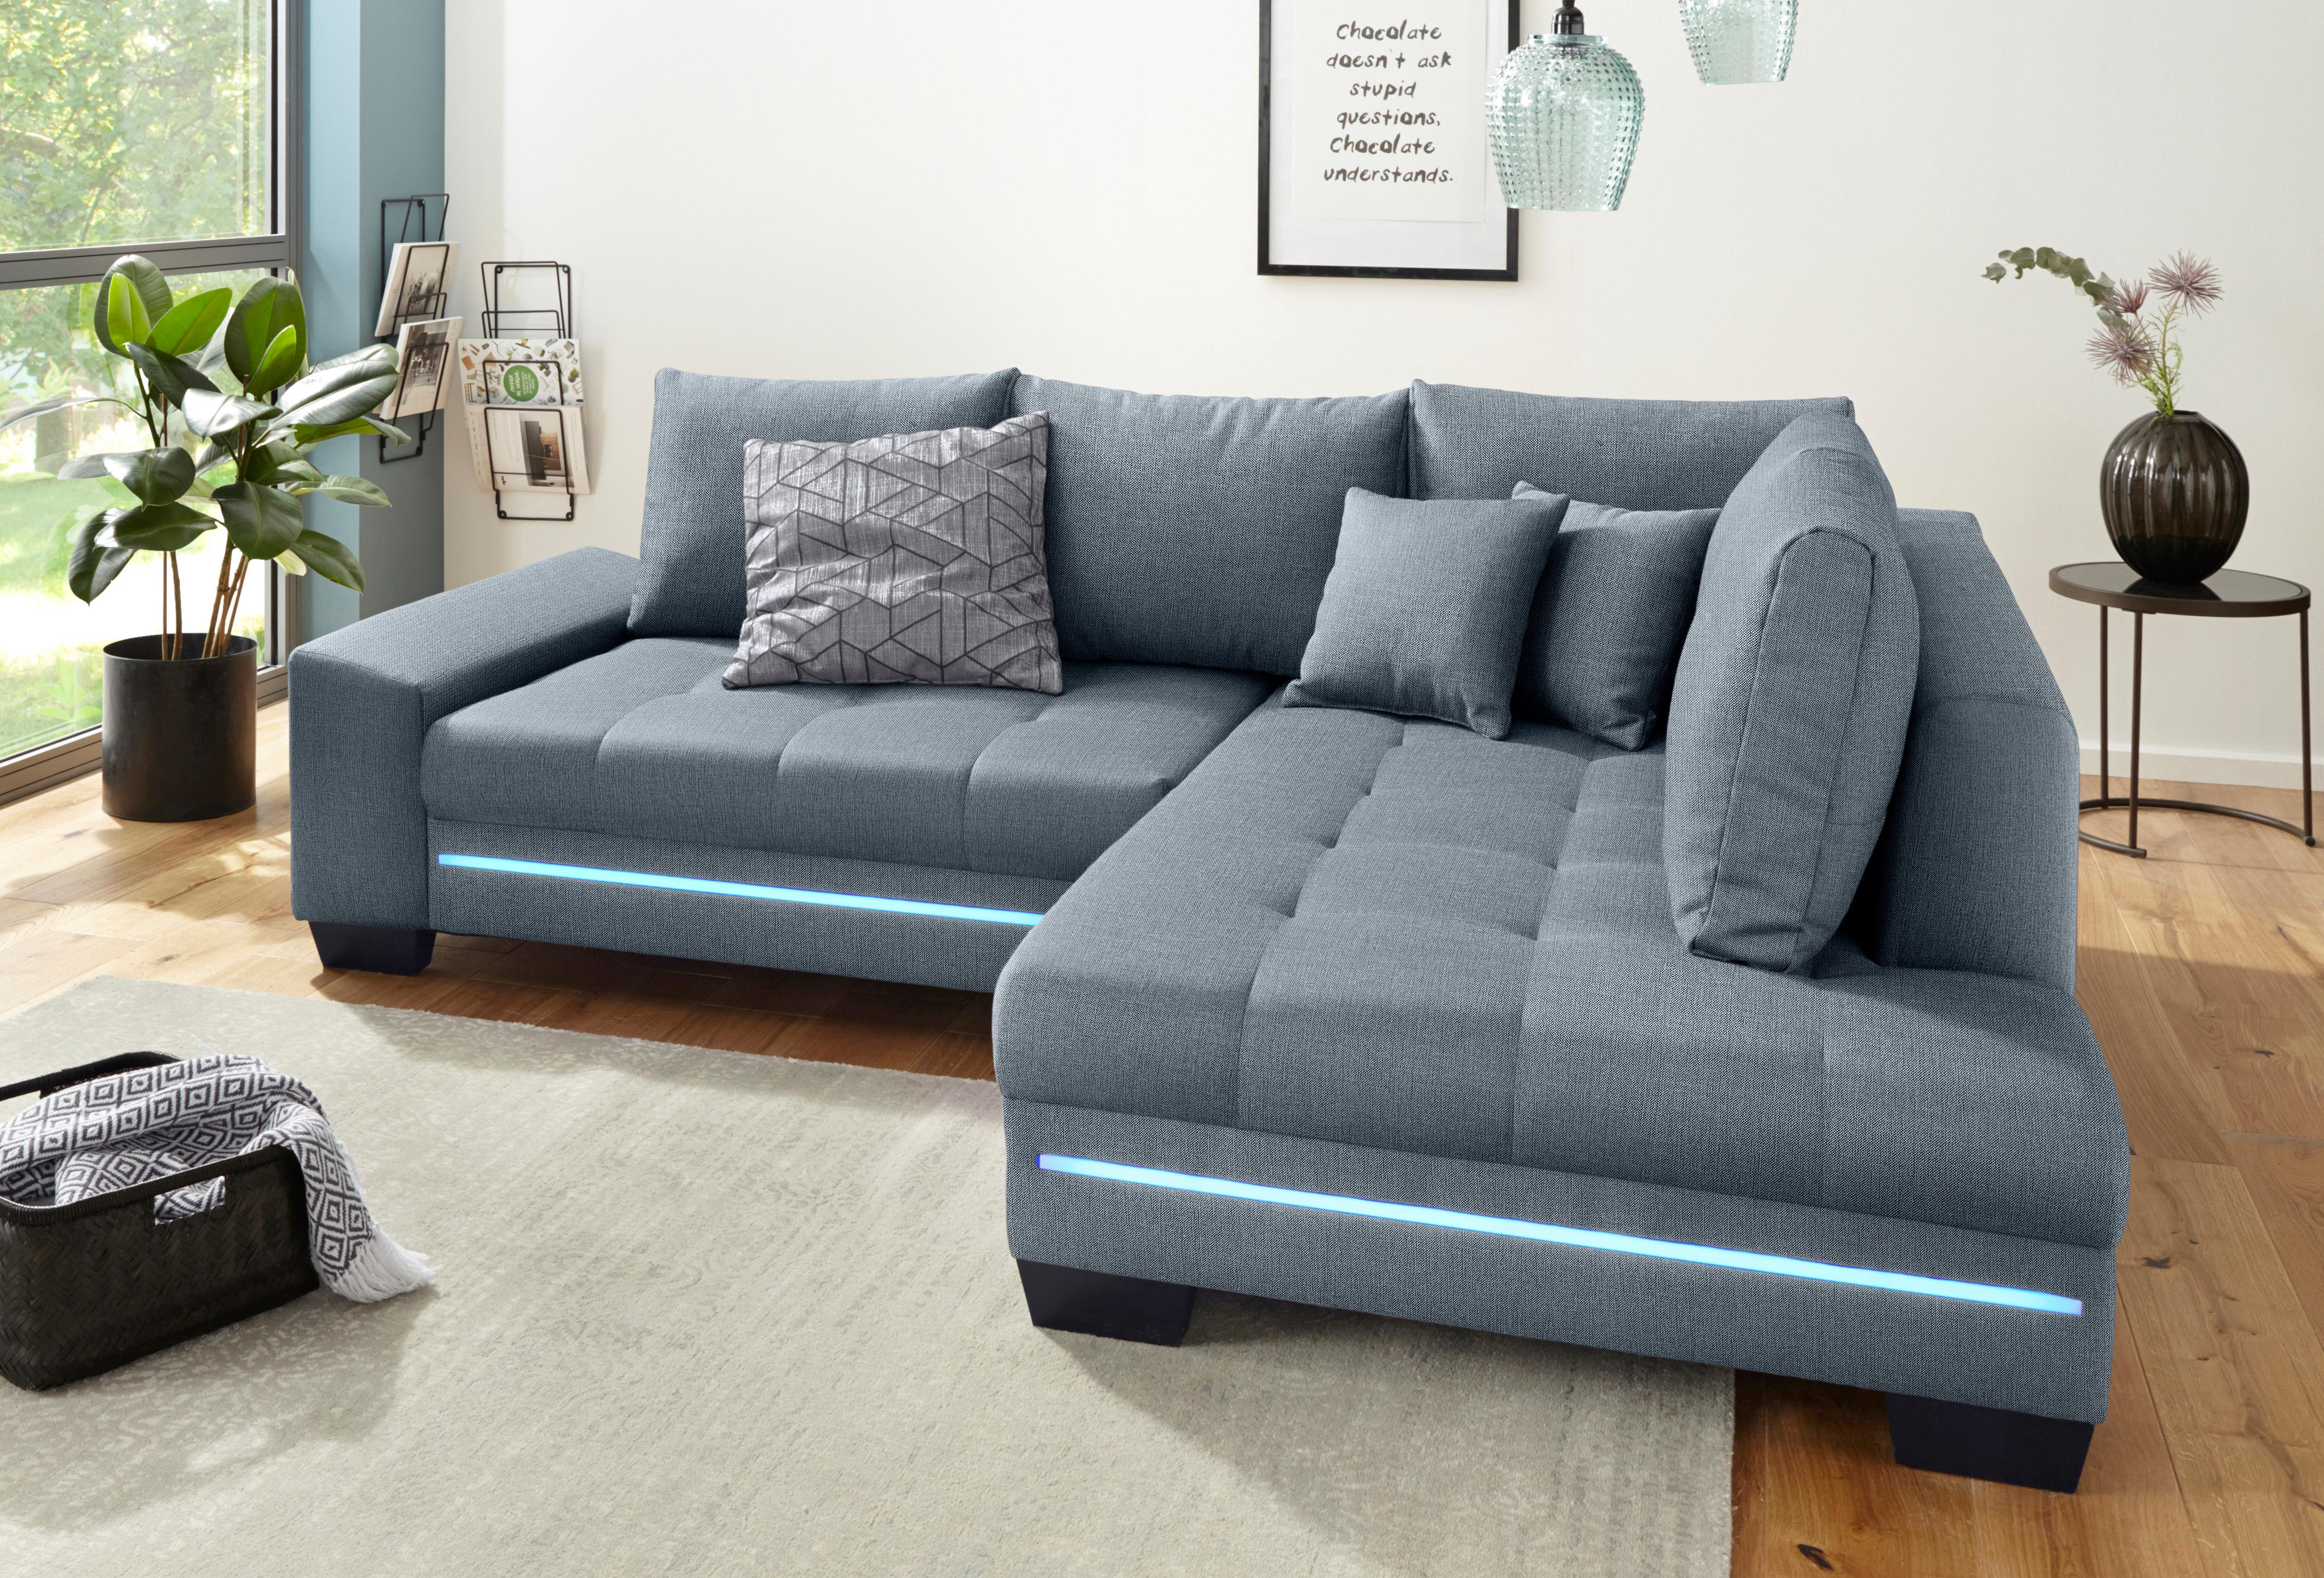 Nova Via Polsterecke, wahlweise mit Bettfunktion | Wohnzimmer > Sofas & Couches > Ecksofas & Eckcouches | Microfaser | NOVA VIA